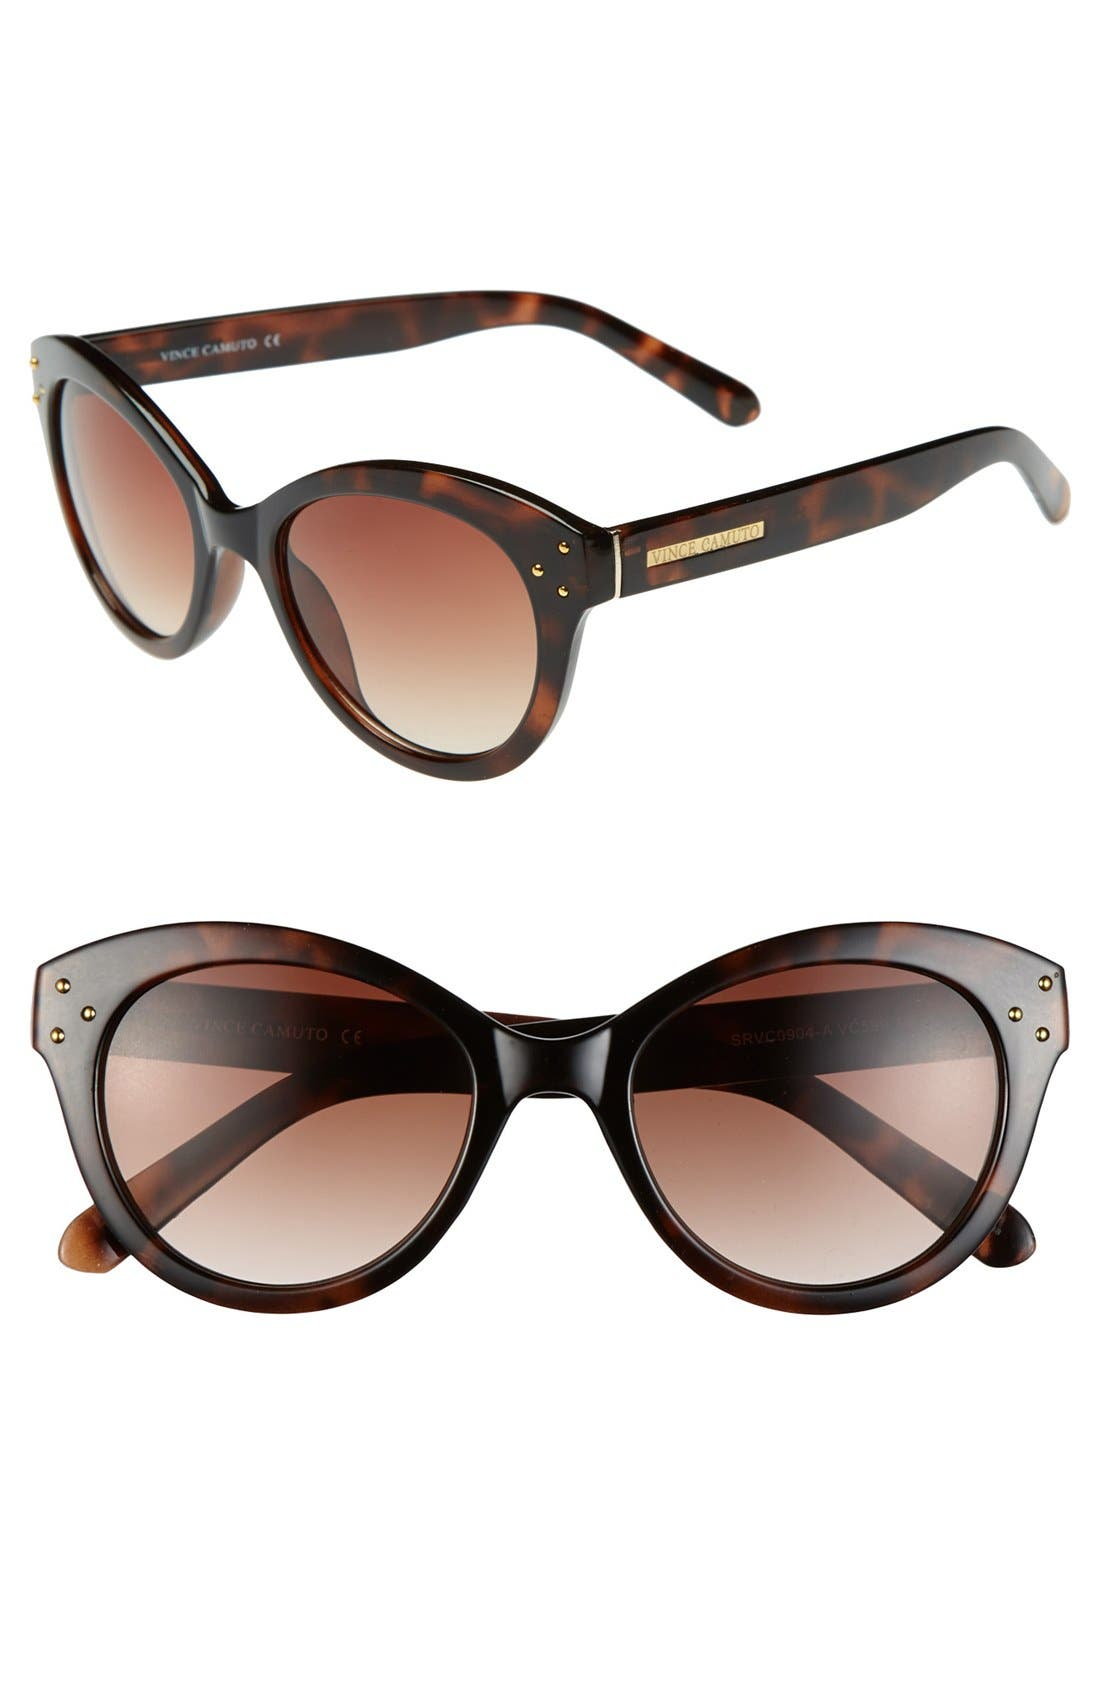 Alternate Image 1 Selected - Vince Camuto 51mm Retro Cat Eye Sunglasses